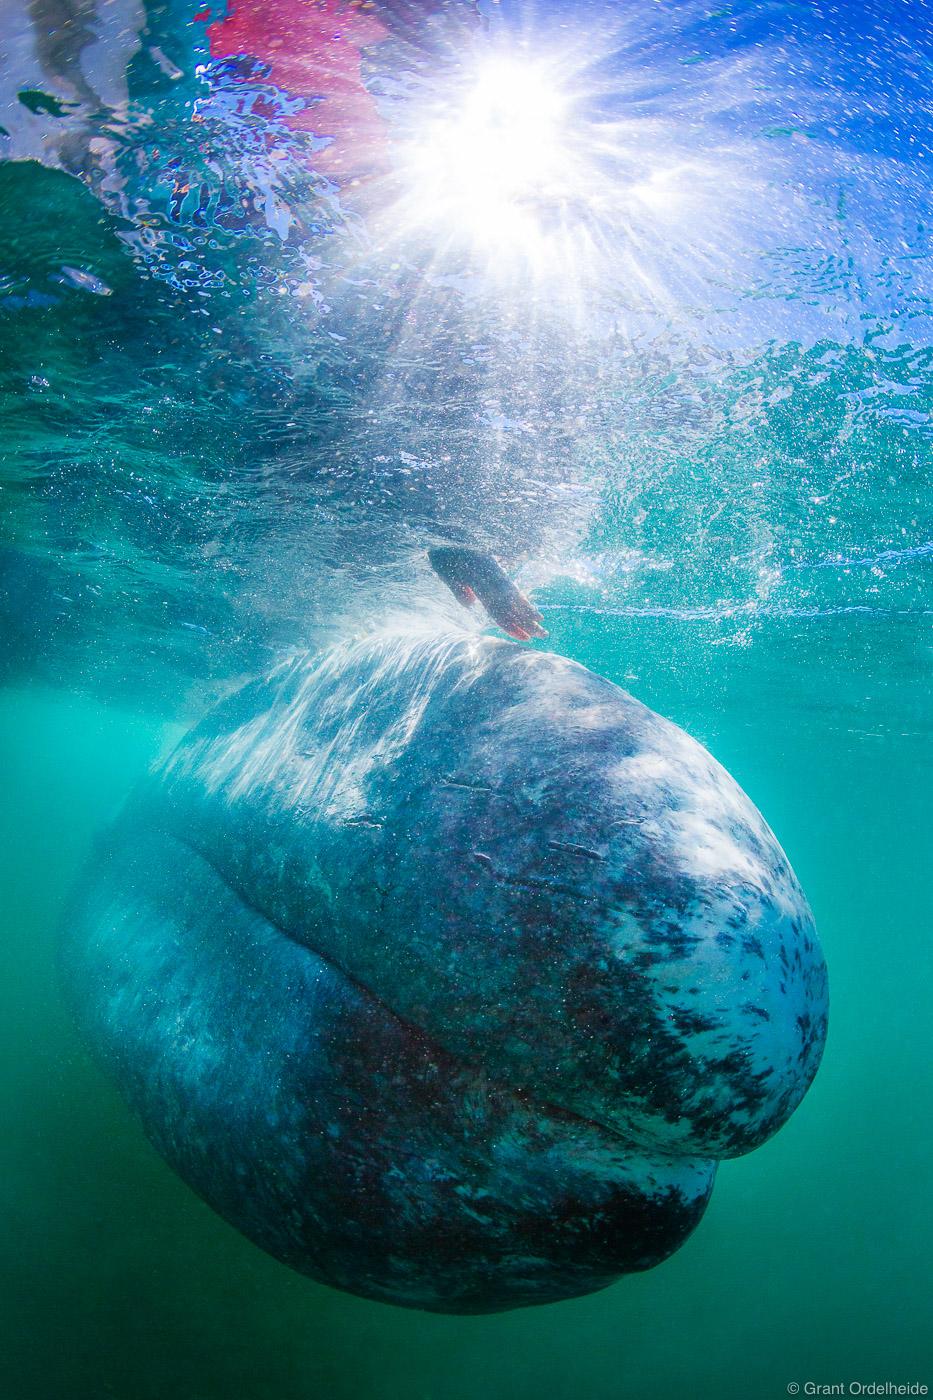 whale, touch, reaches, pet, curious, friendly, gray, whale, eschrichtius robustus, mexico, san ignacio, lagoon, baja, california, sur, photo